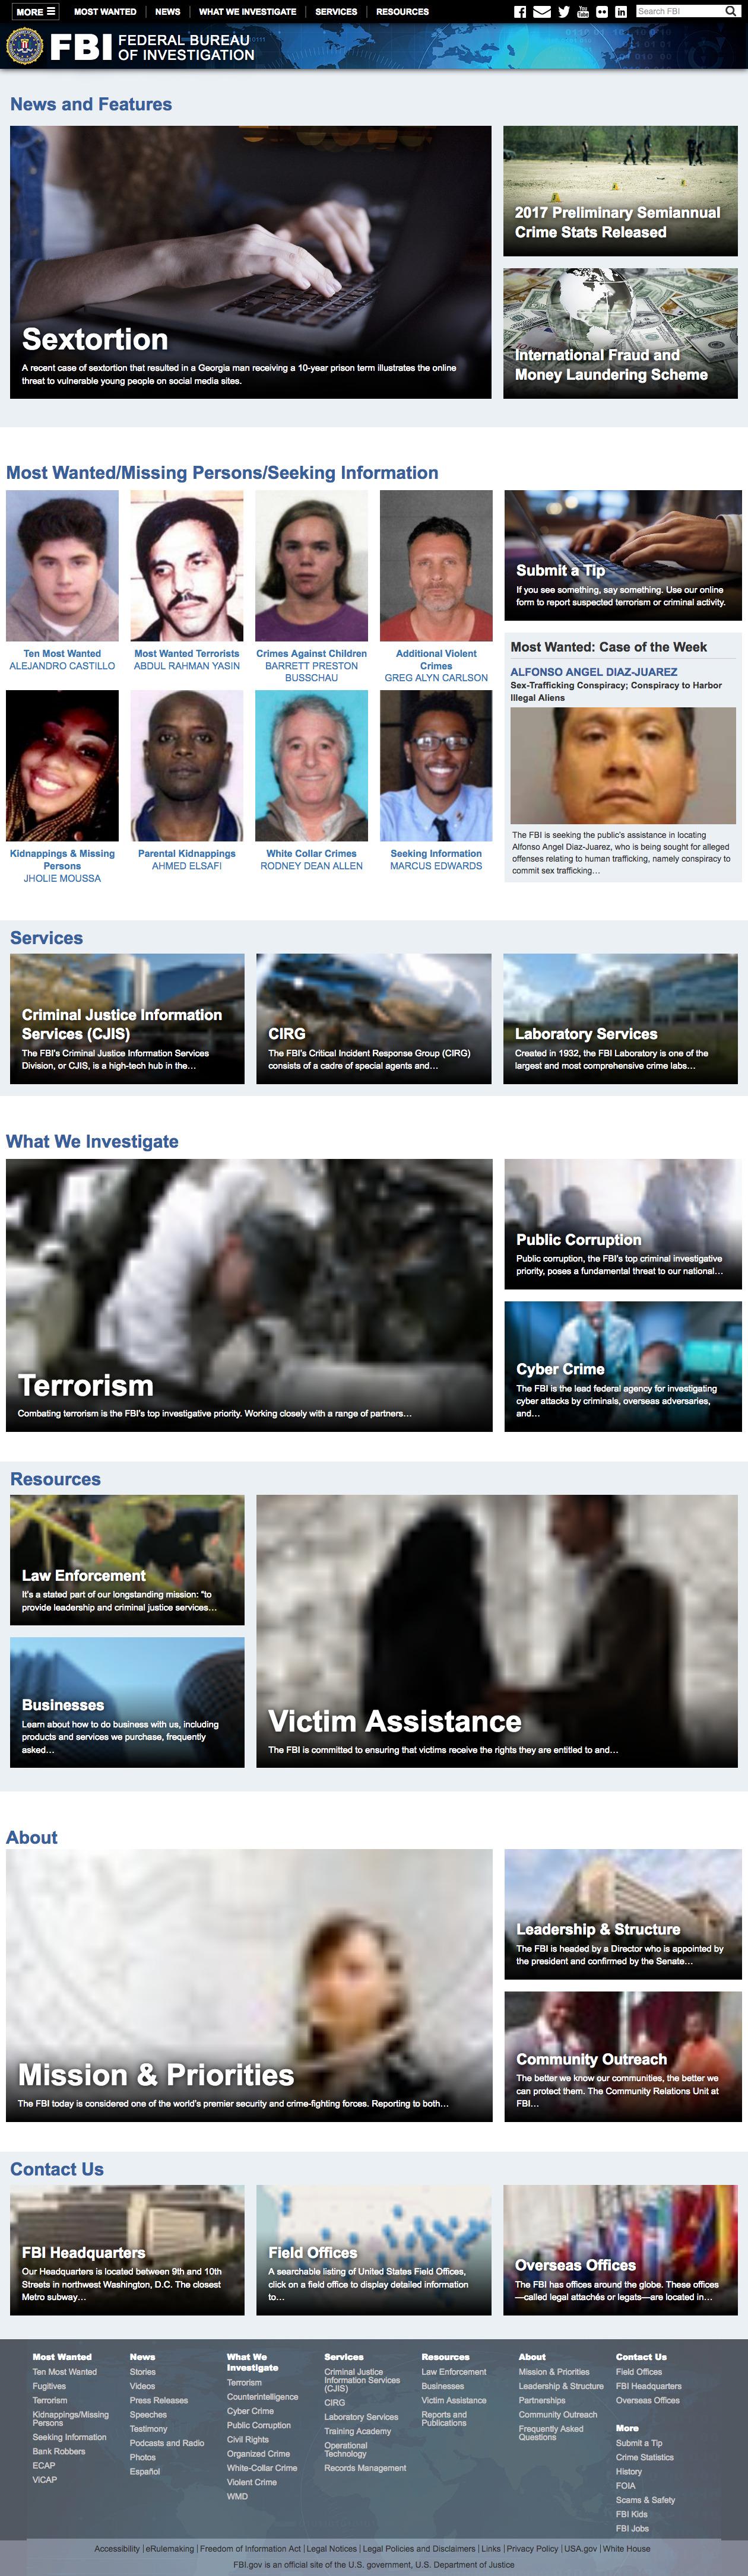 FBI Main Page